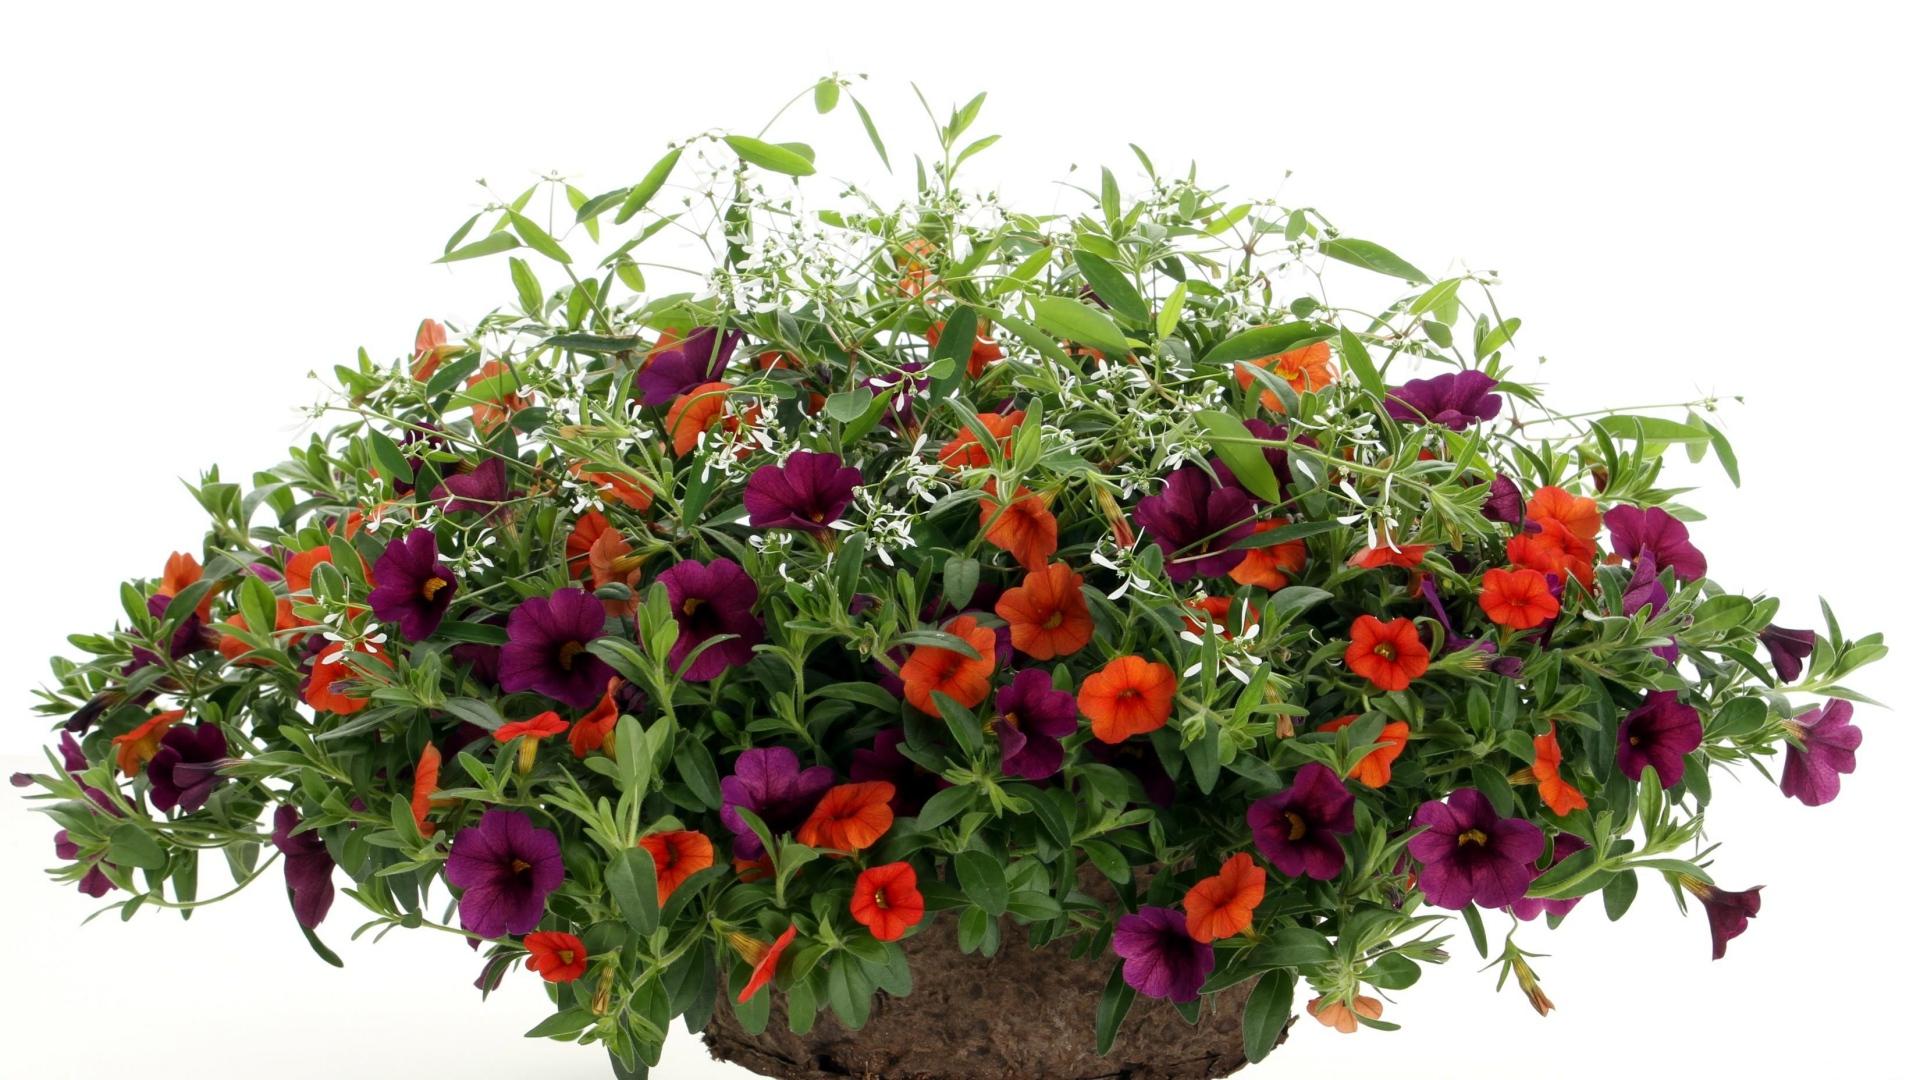 Download Wallpaper petunia bright flowers pots white